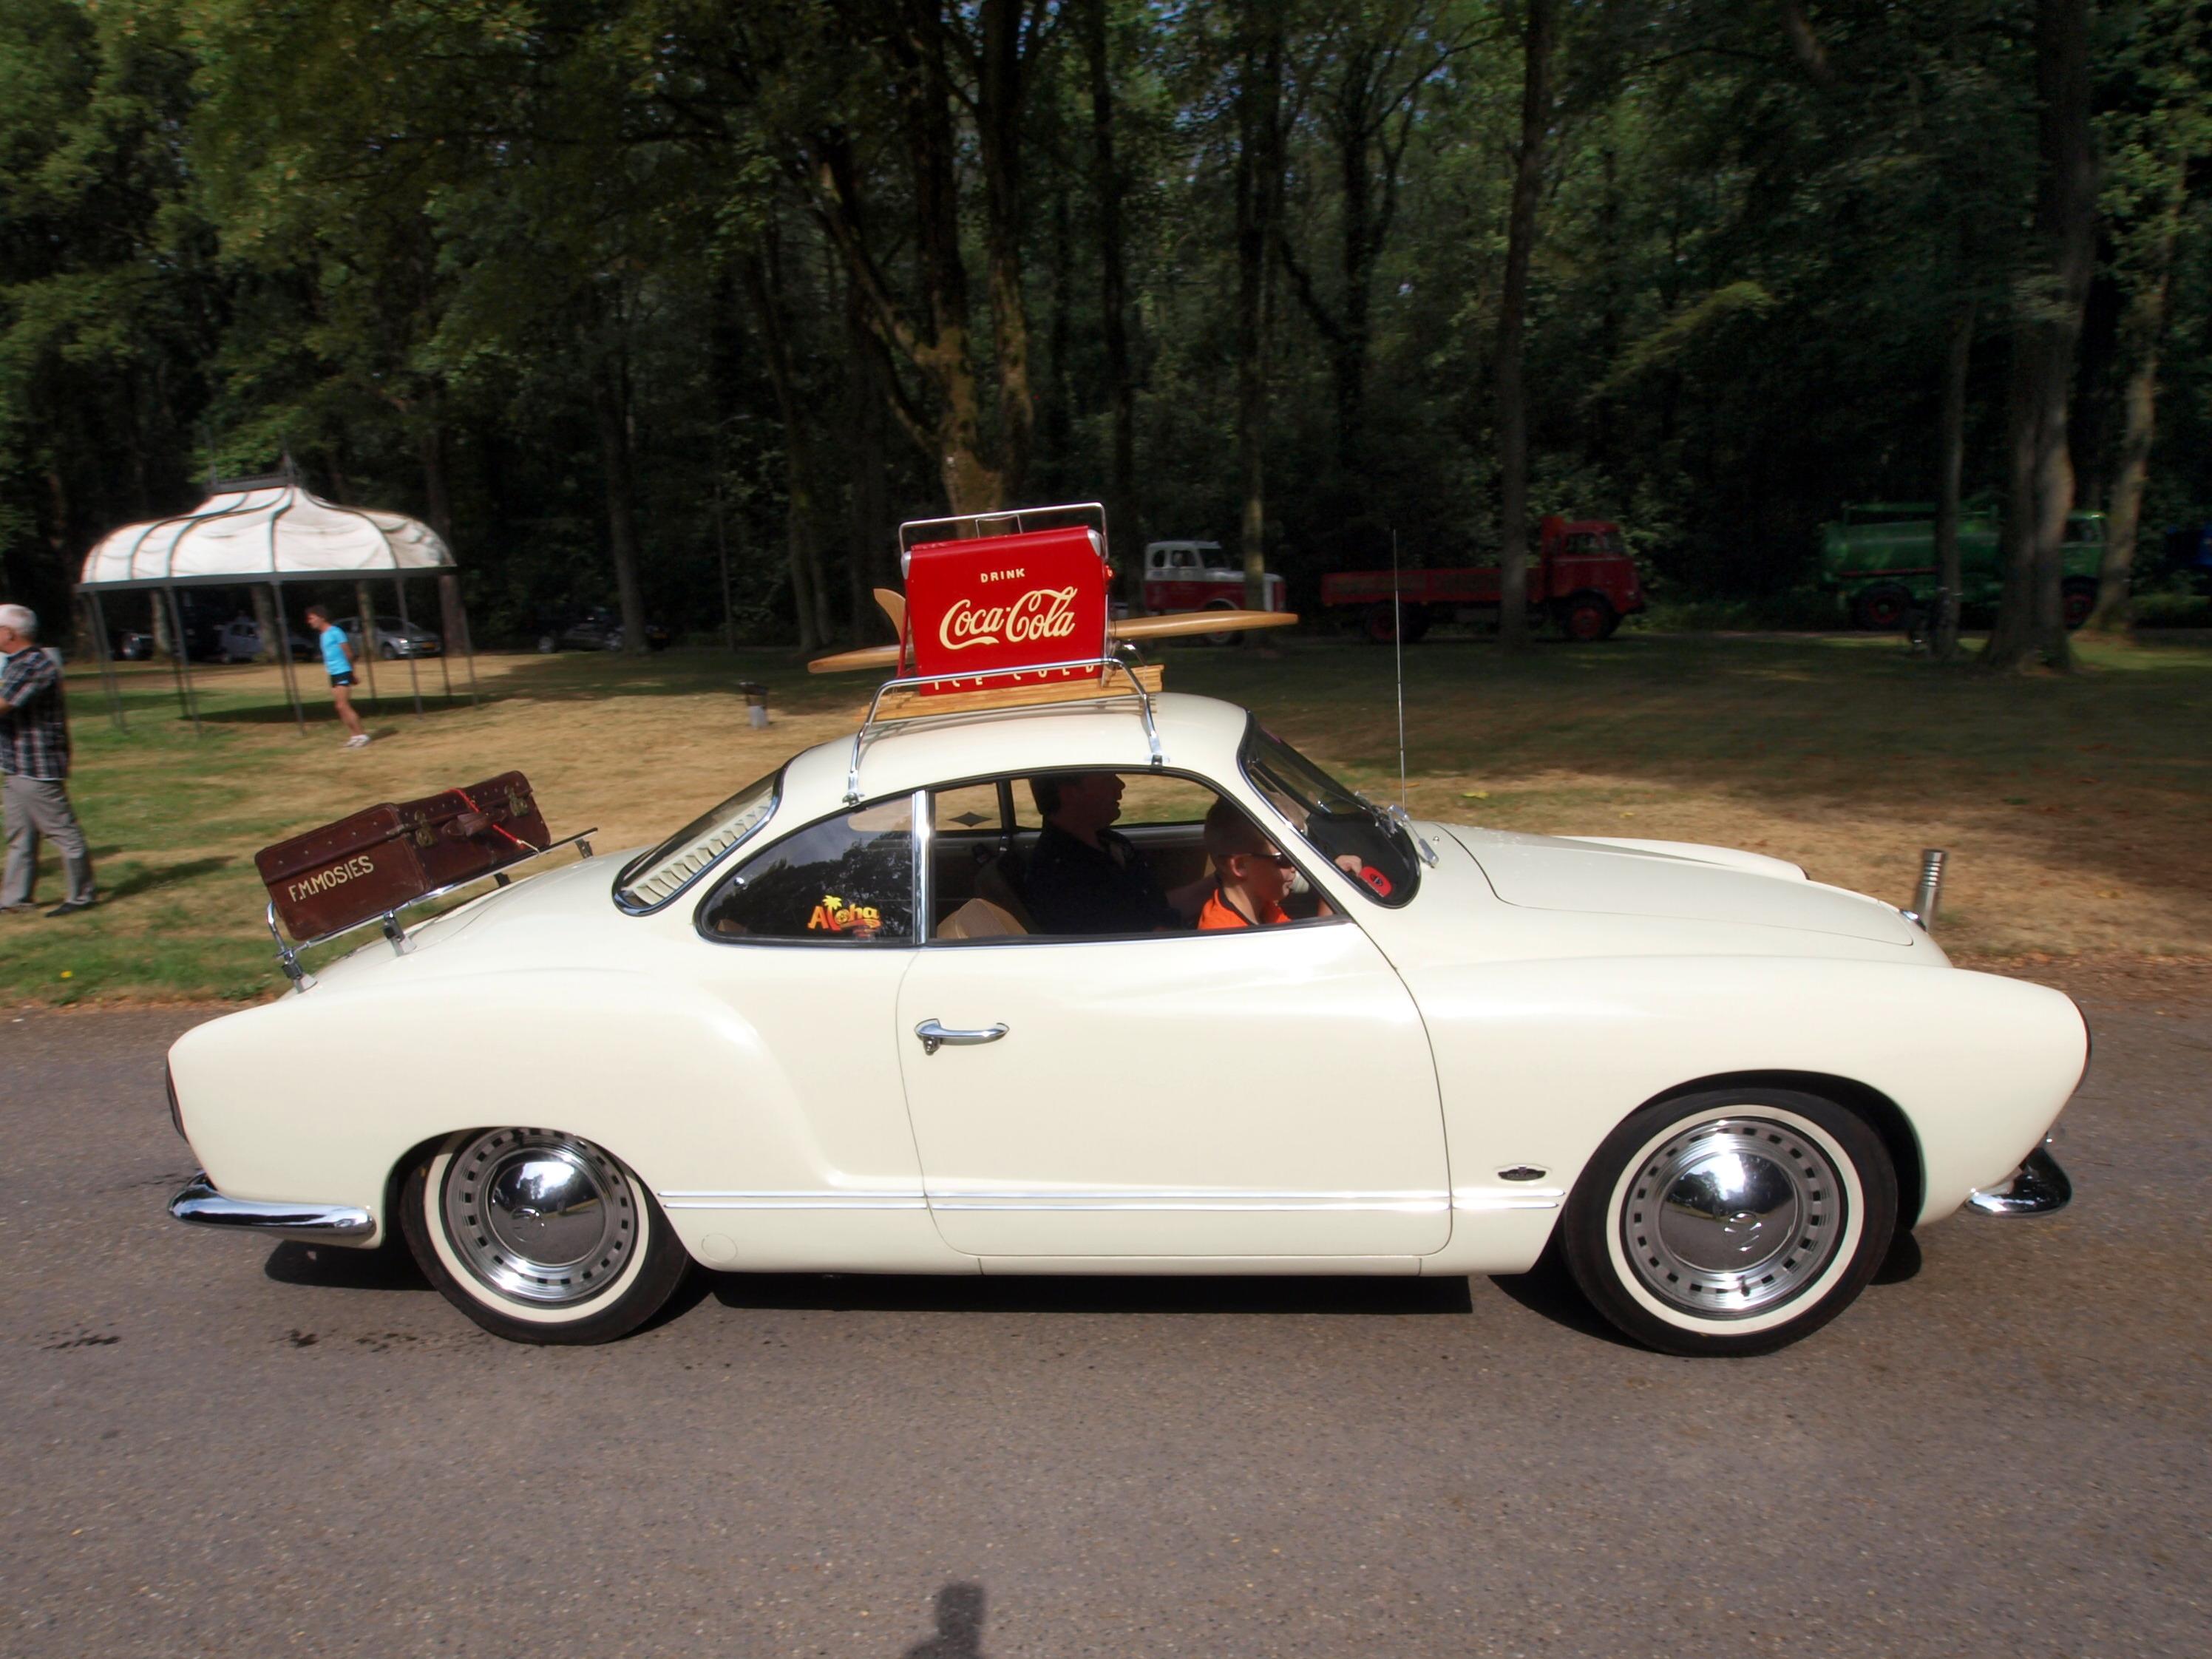 Volkswagen type 14 karmann ghia picture 5 reviews news specs buy car